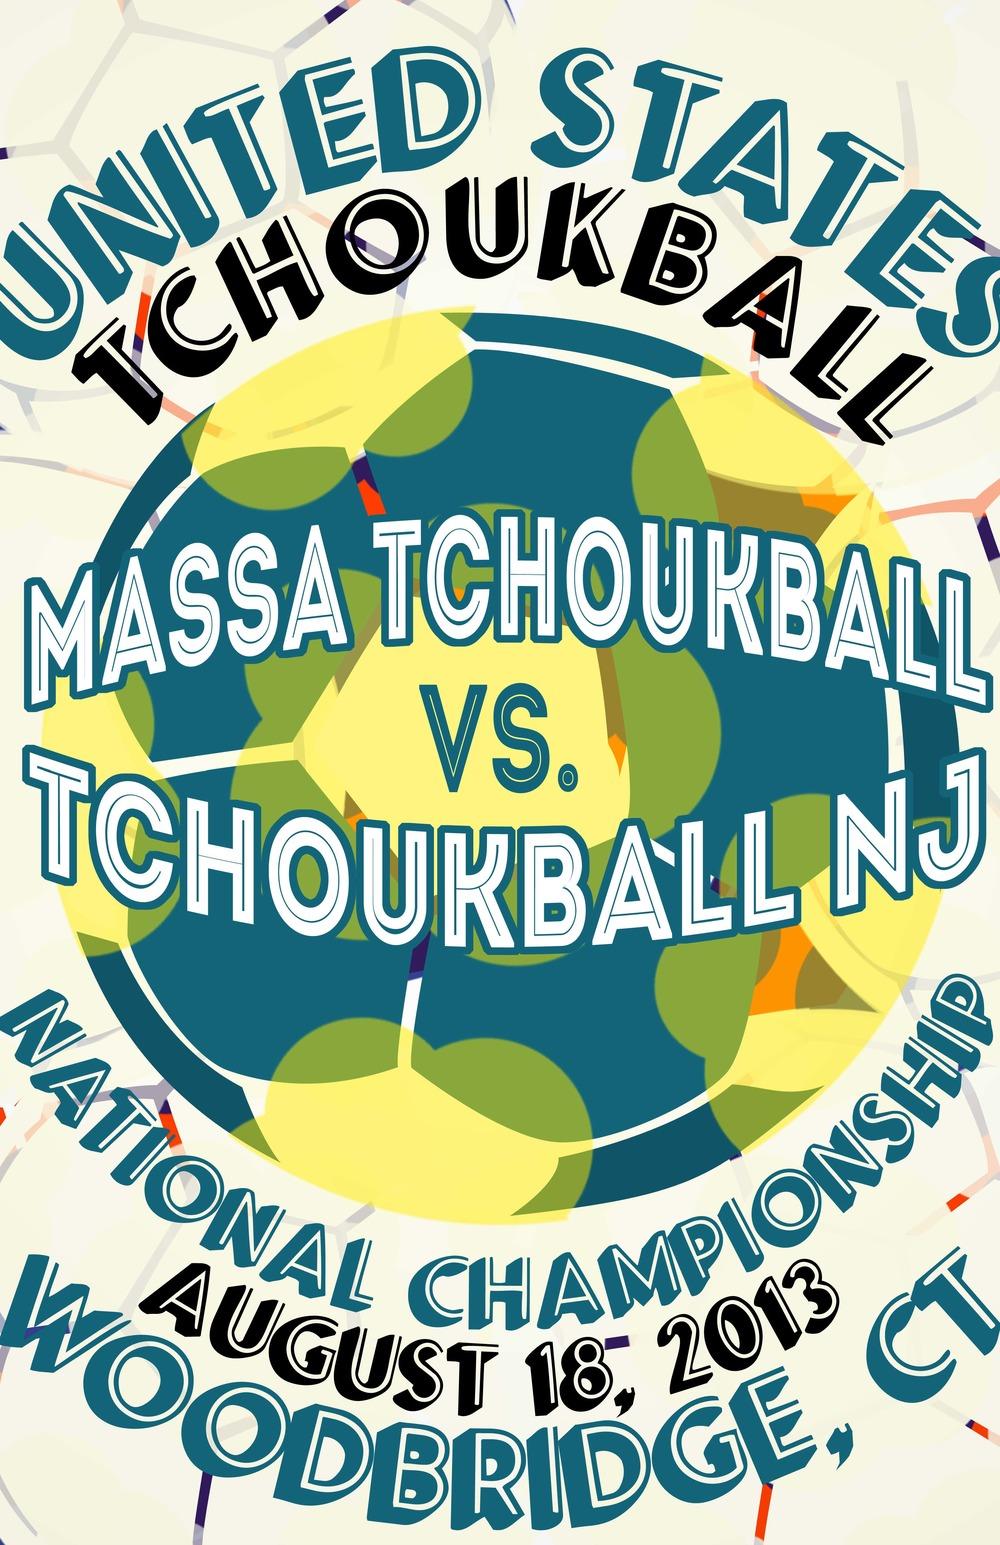 2013 USTBA National Championship - August 18 Woodbridge, CT